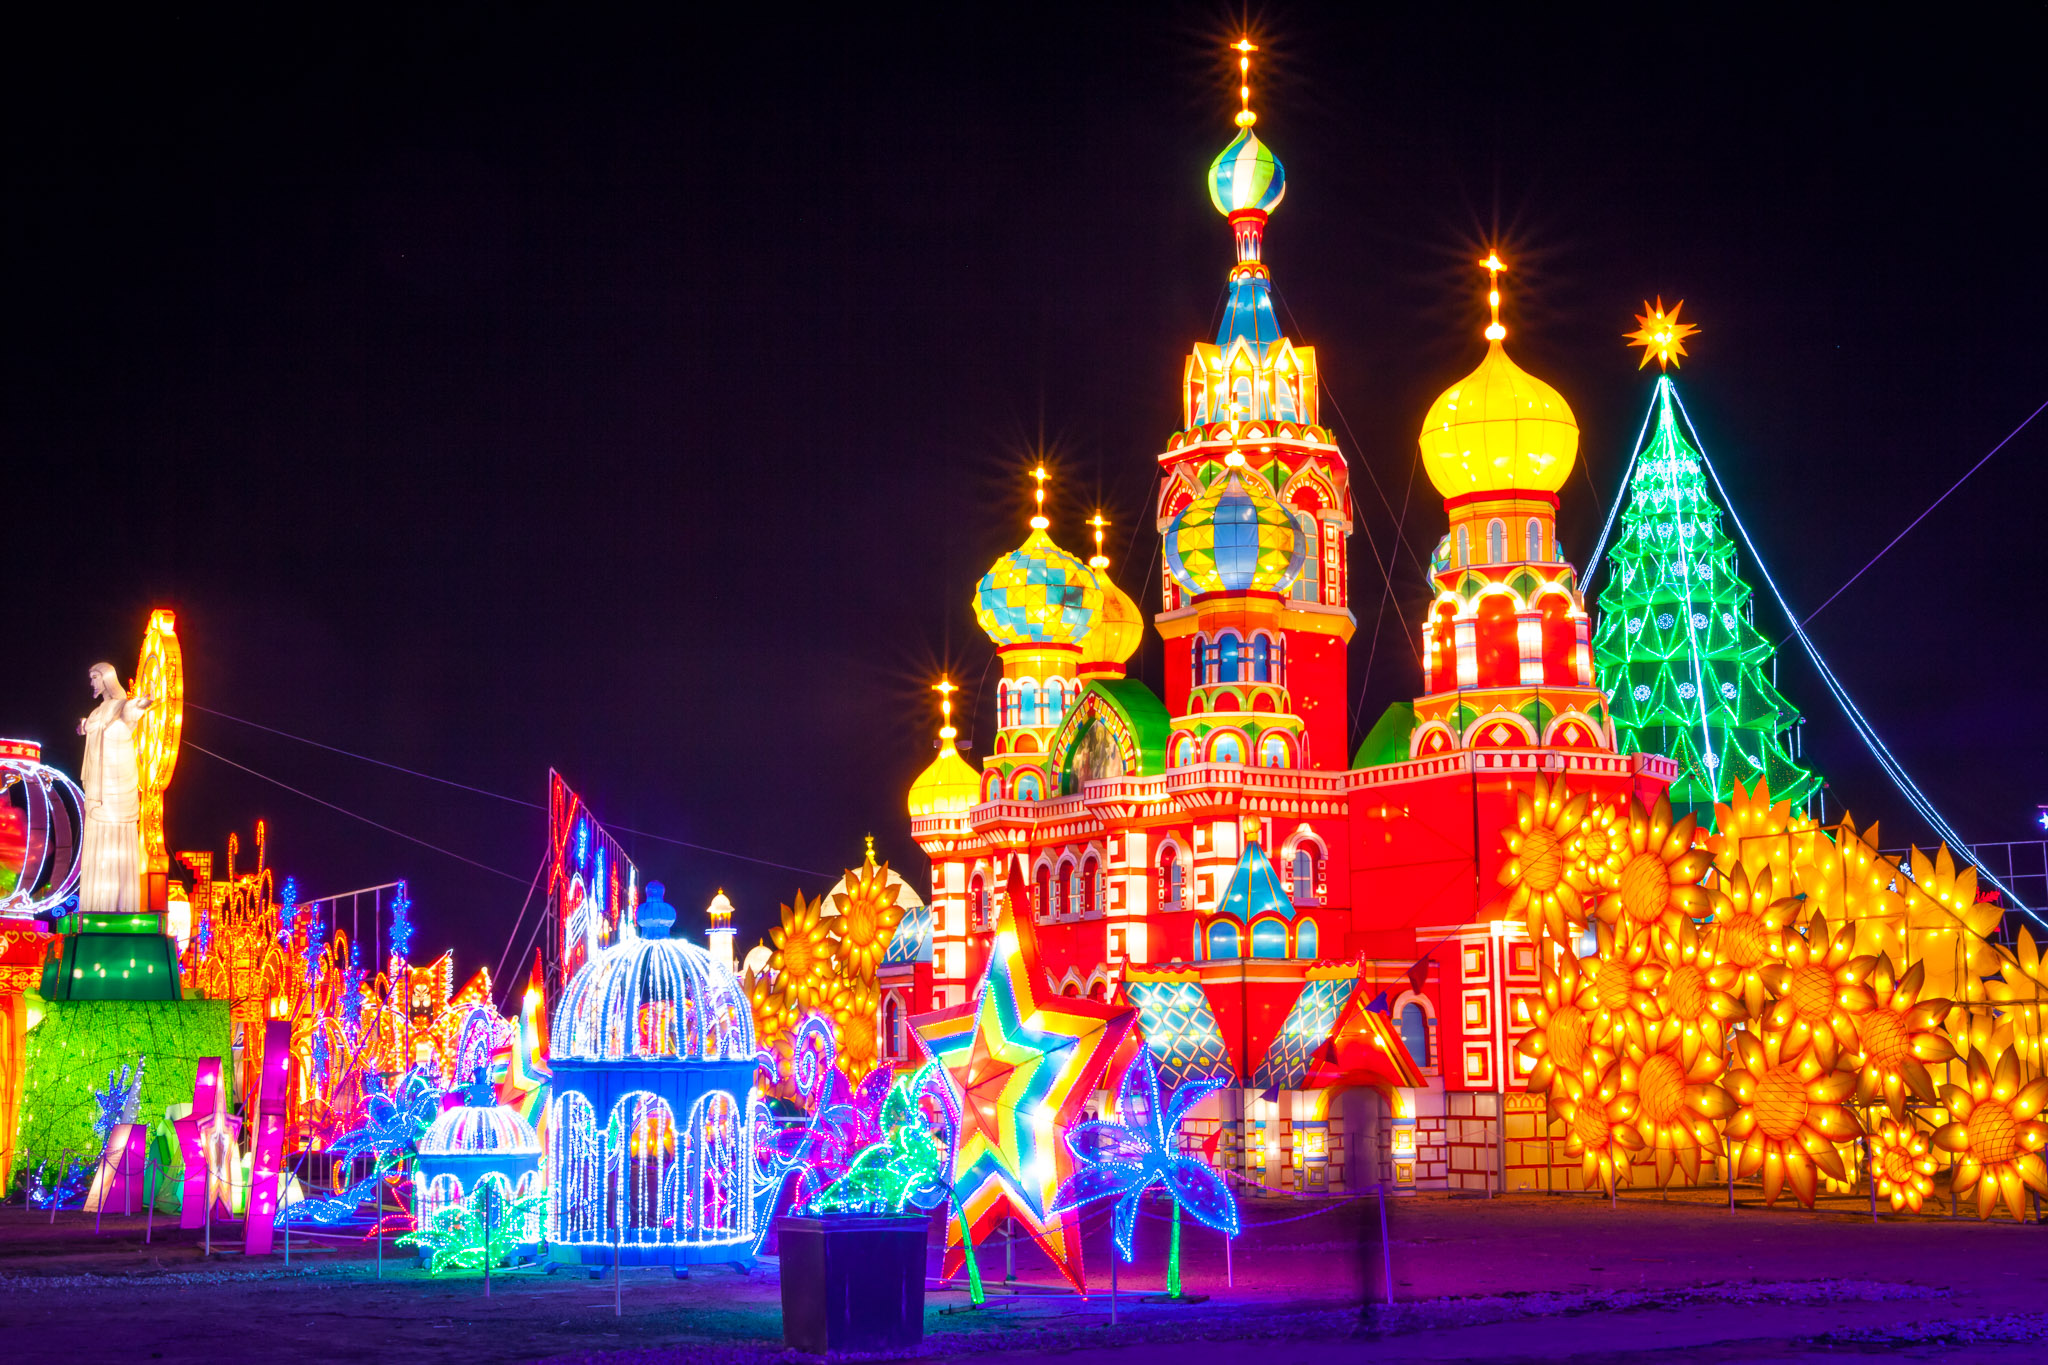 Houston Holiday Lights: Magical Winter Lights & Lantern Festival ...